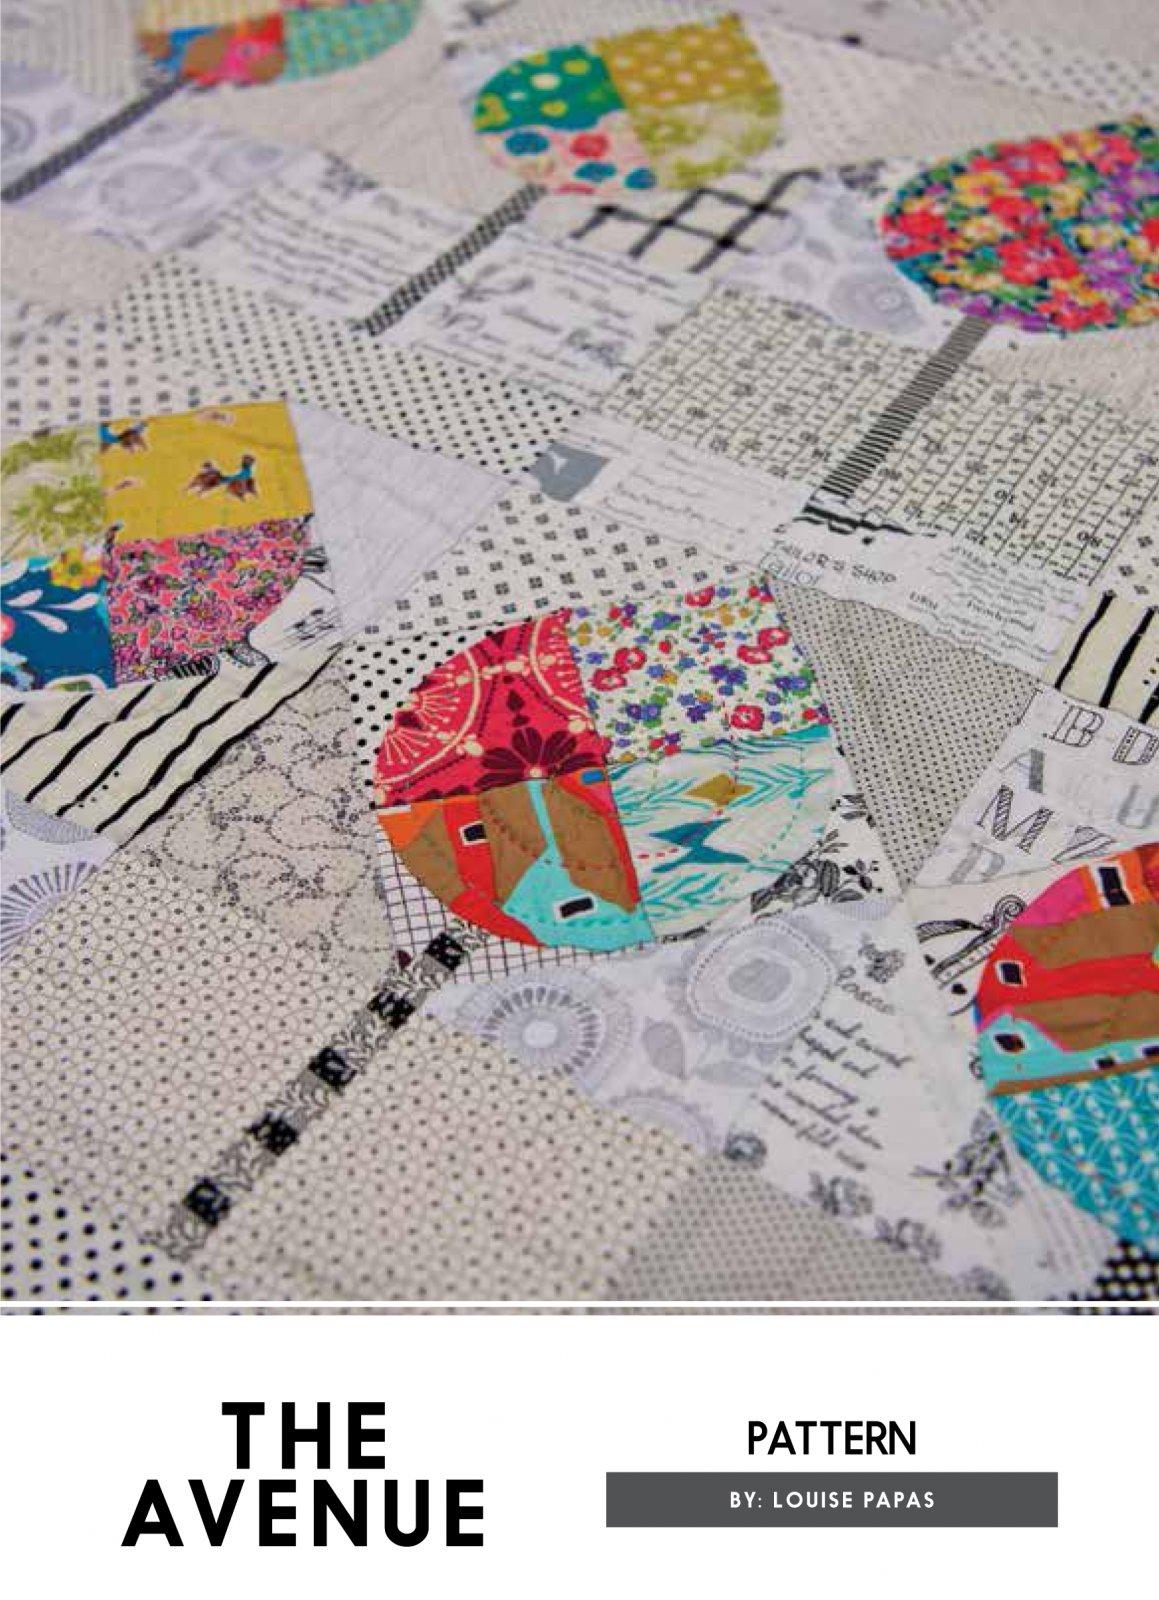 The Avenue Pattern by Louise Papas for Jen Kingwell Designs